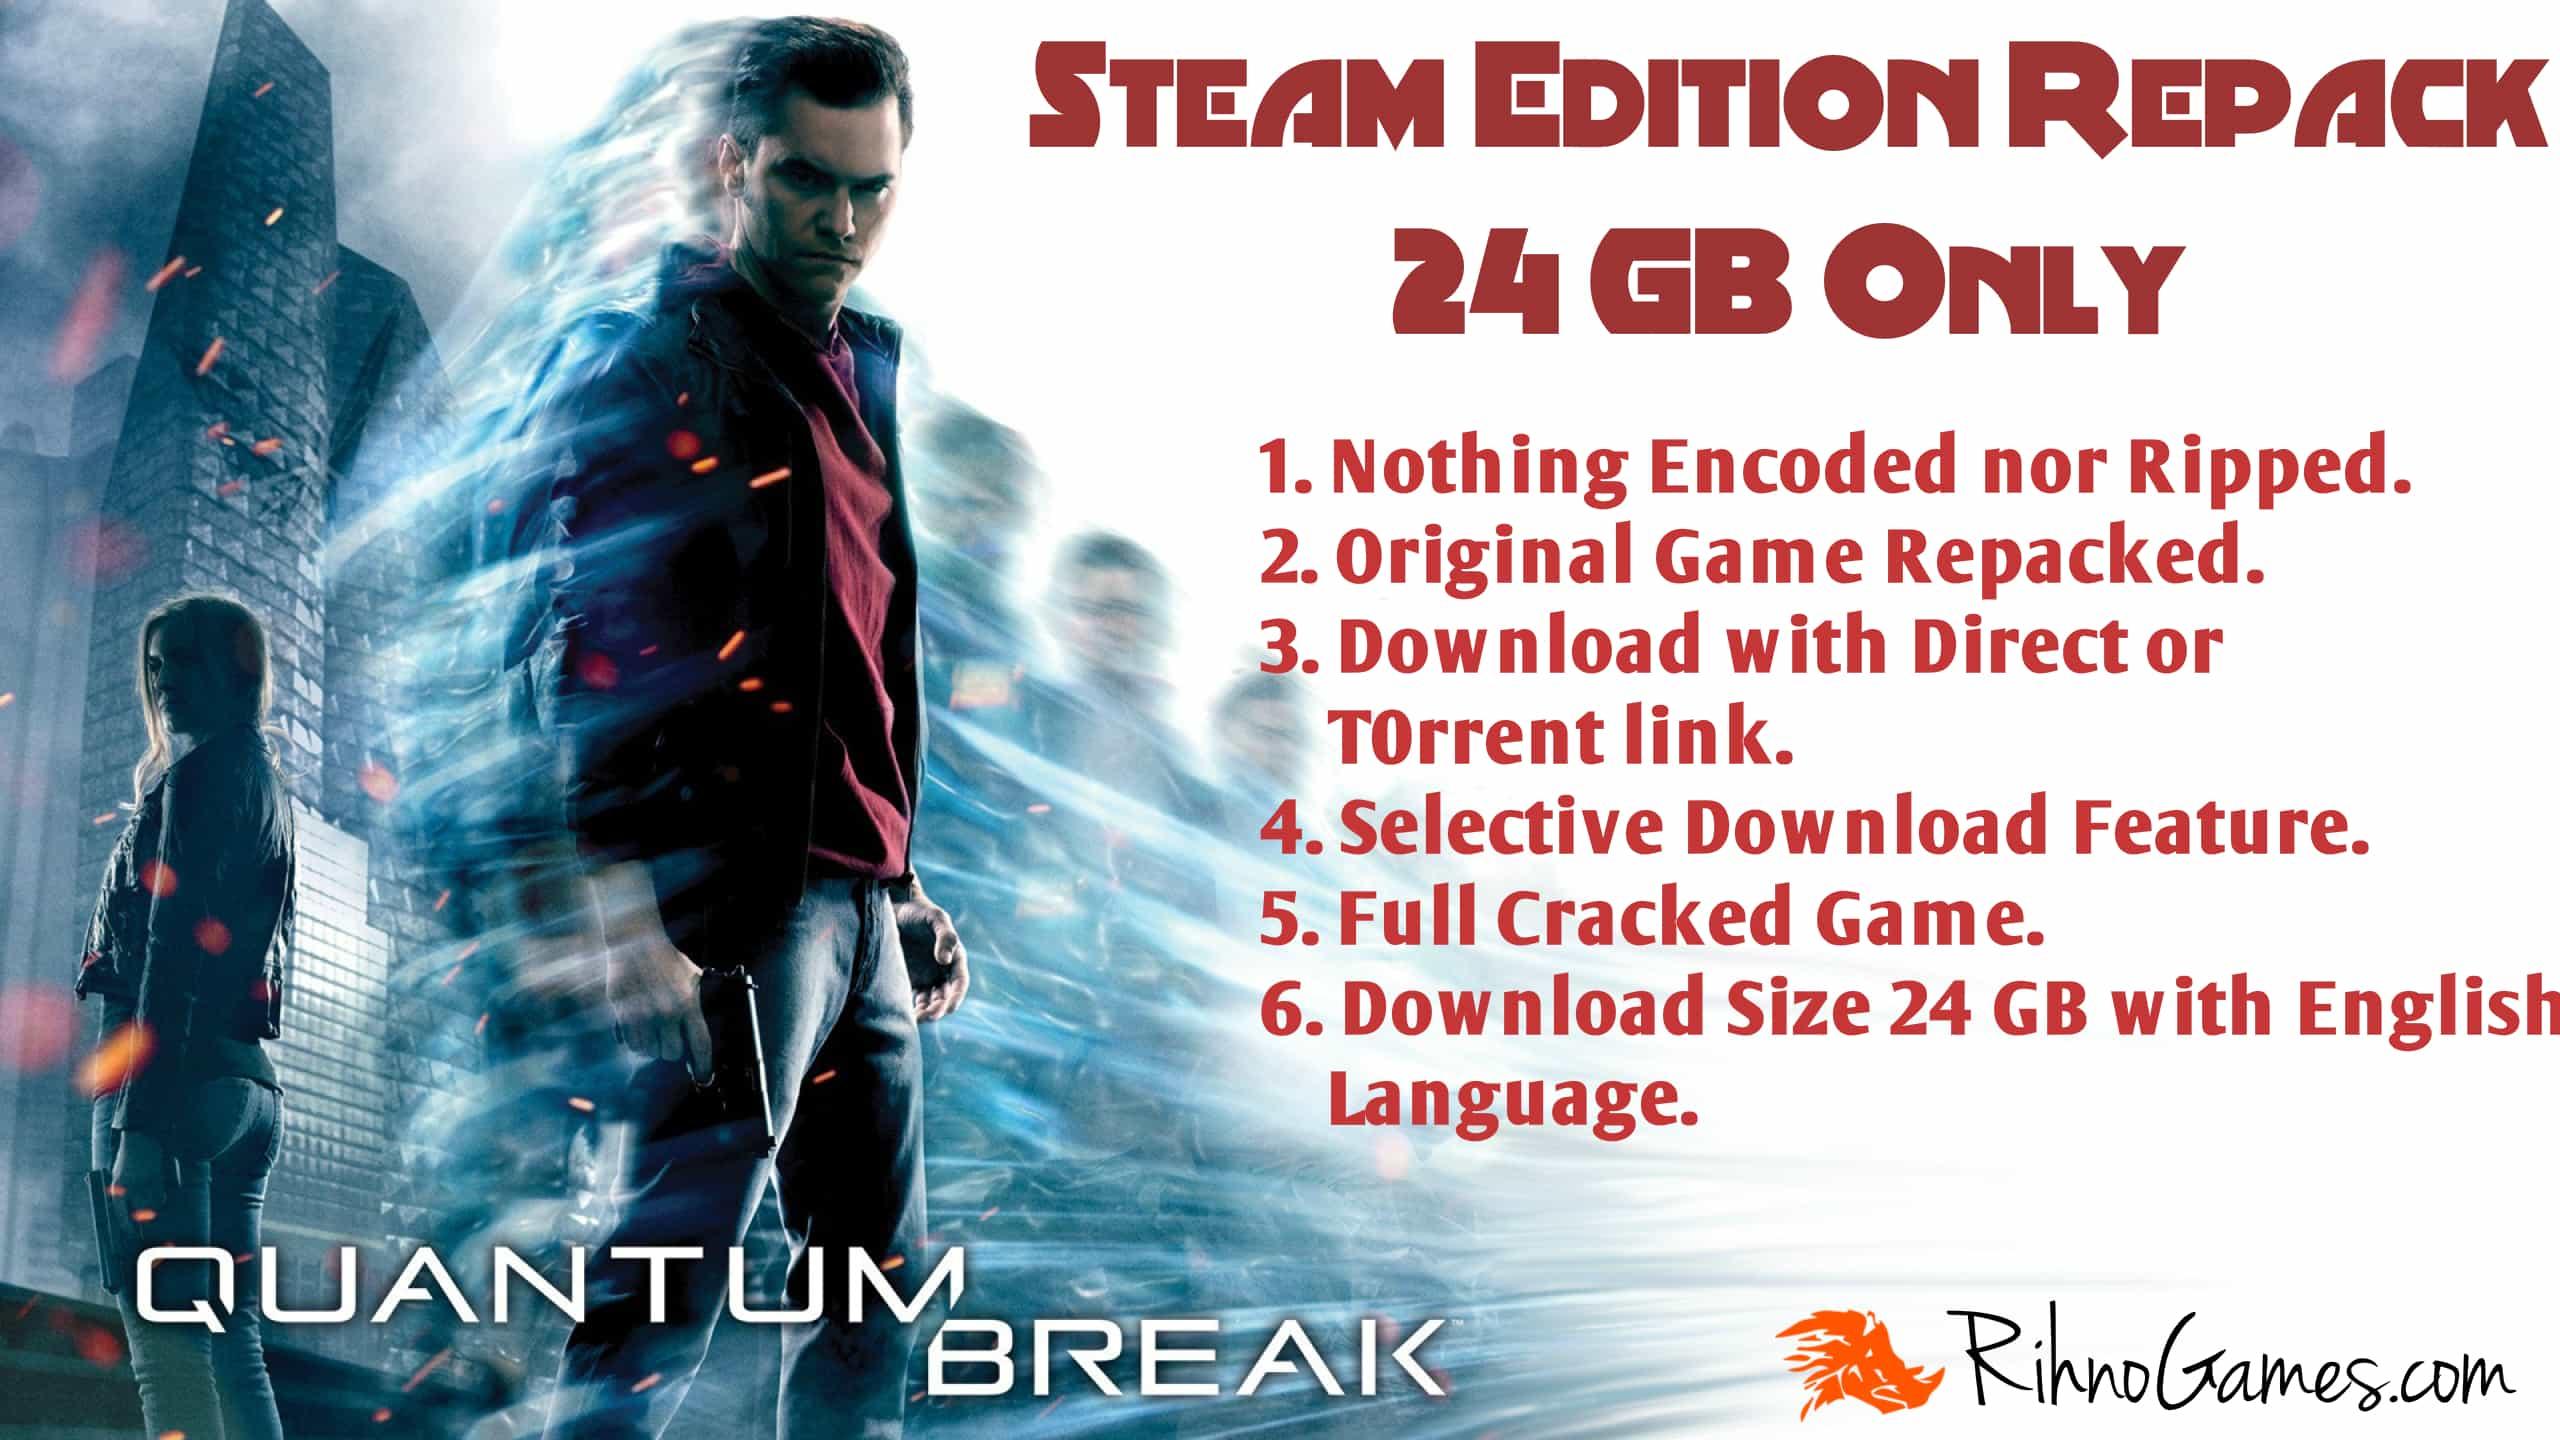 Quantum Break Free Download PC Game Steam Edition Repack 24GB